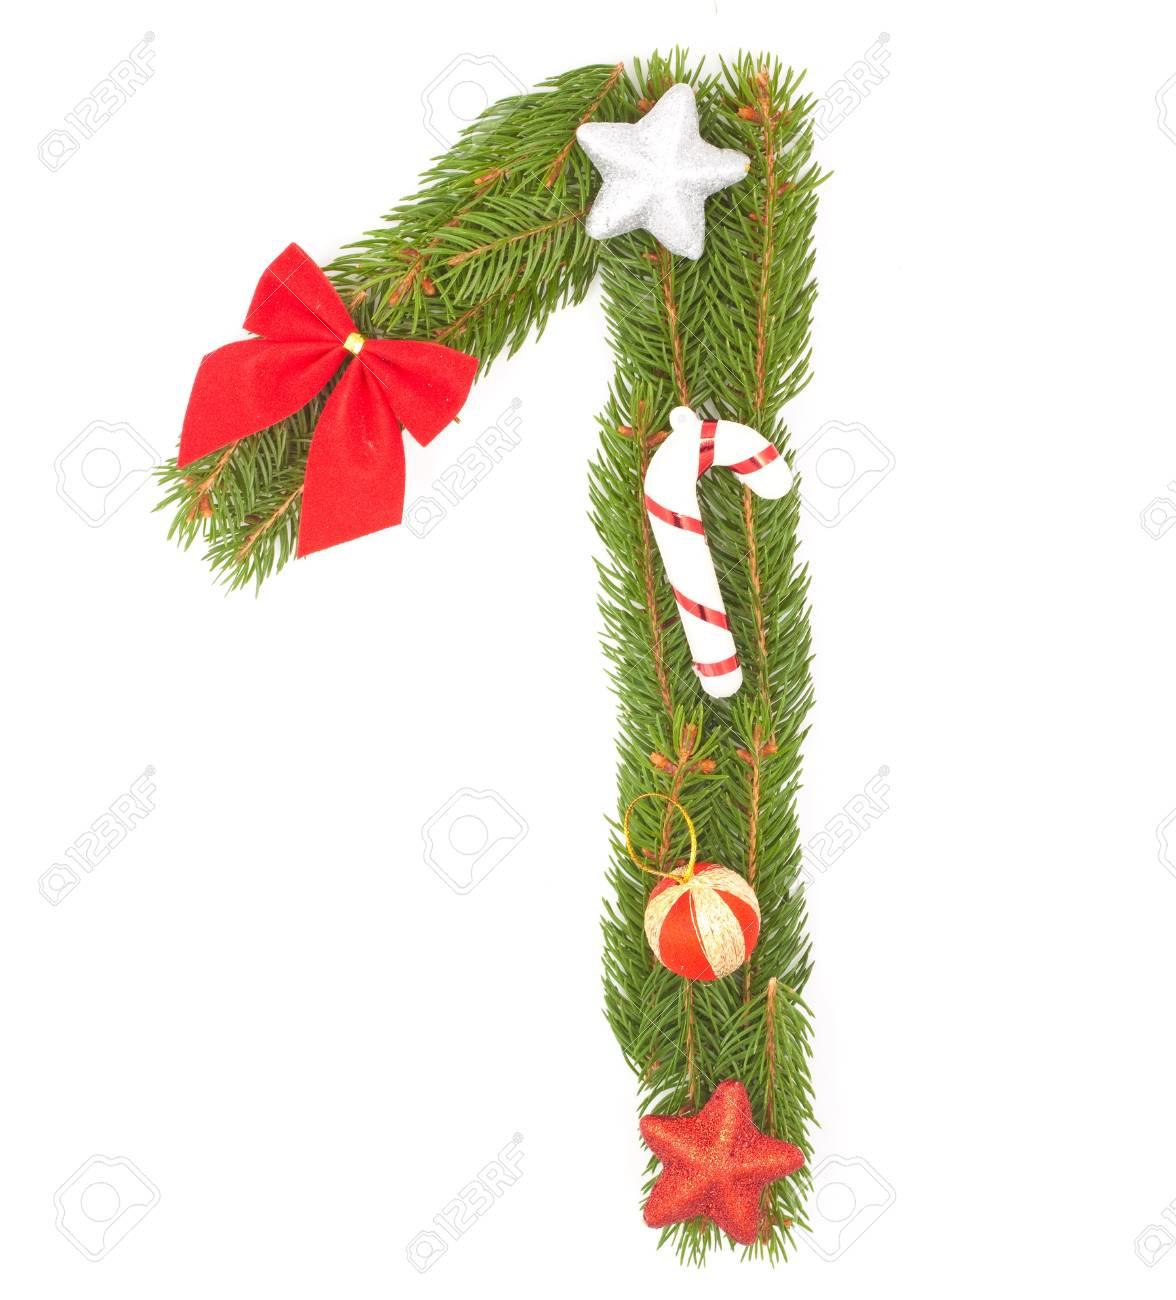 Christmas Alphabet. Part of full set isolated on a white background Stock Photo - 8251641